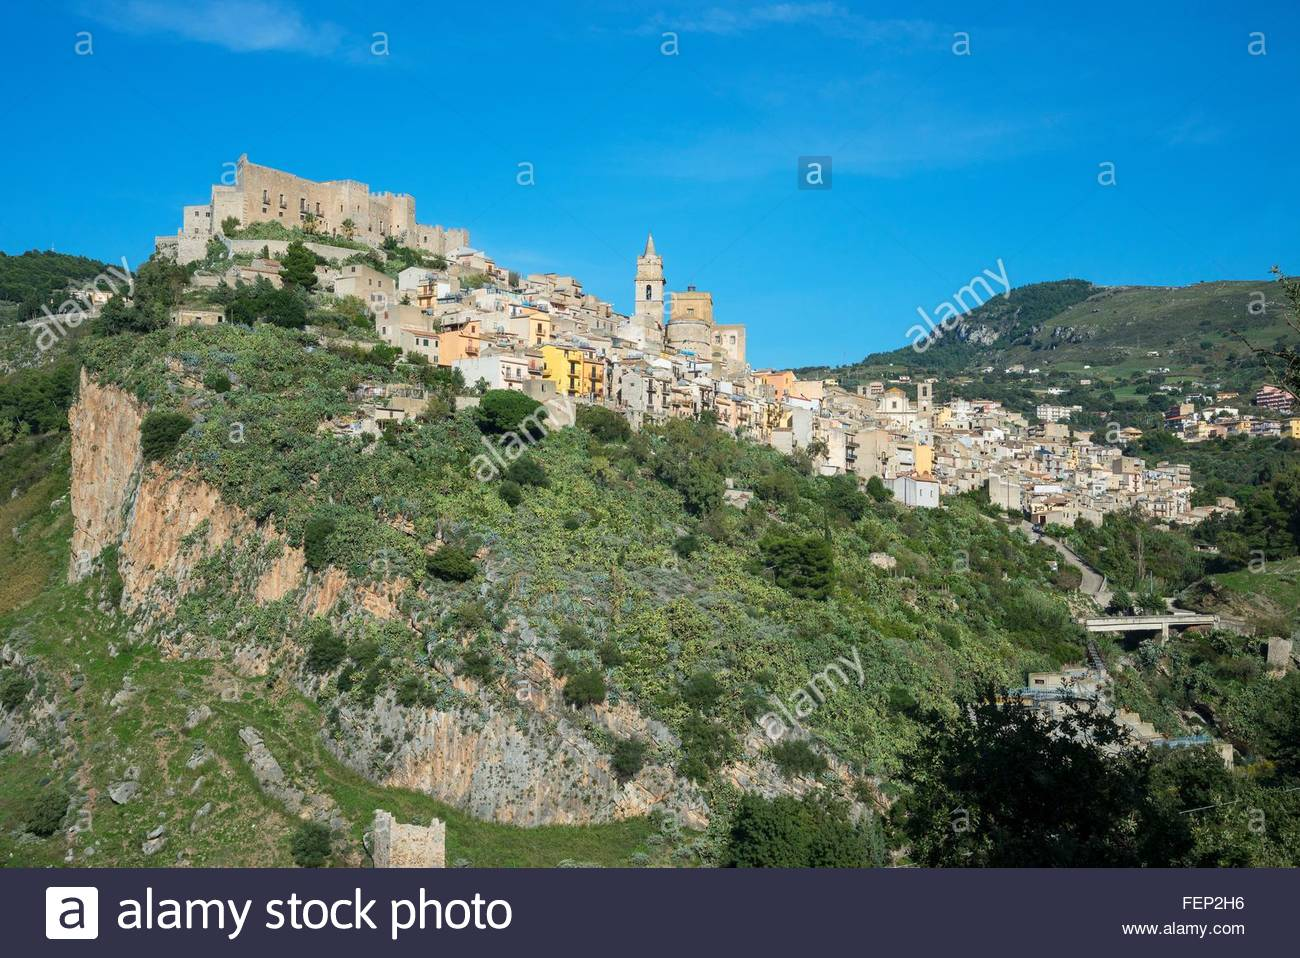 Caccamo Burg, Caccamo, Sizilien, Italien Stockbild